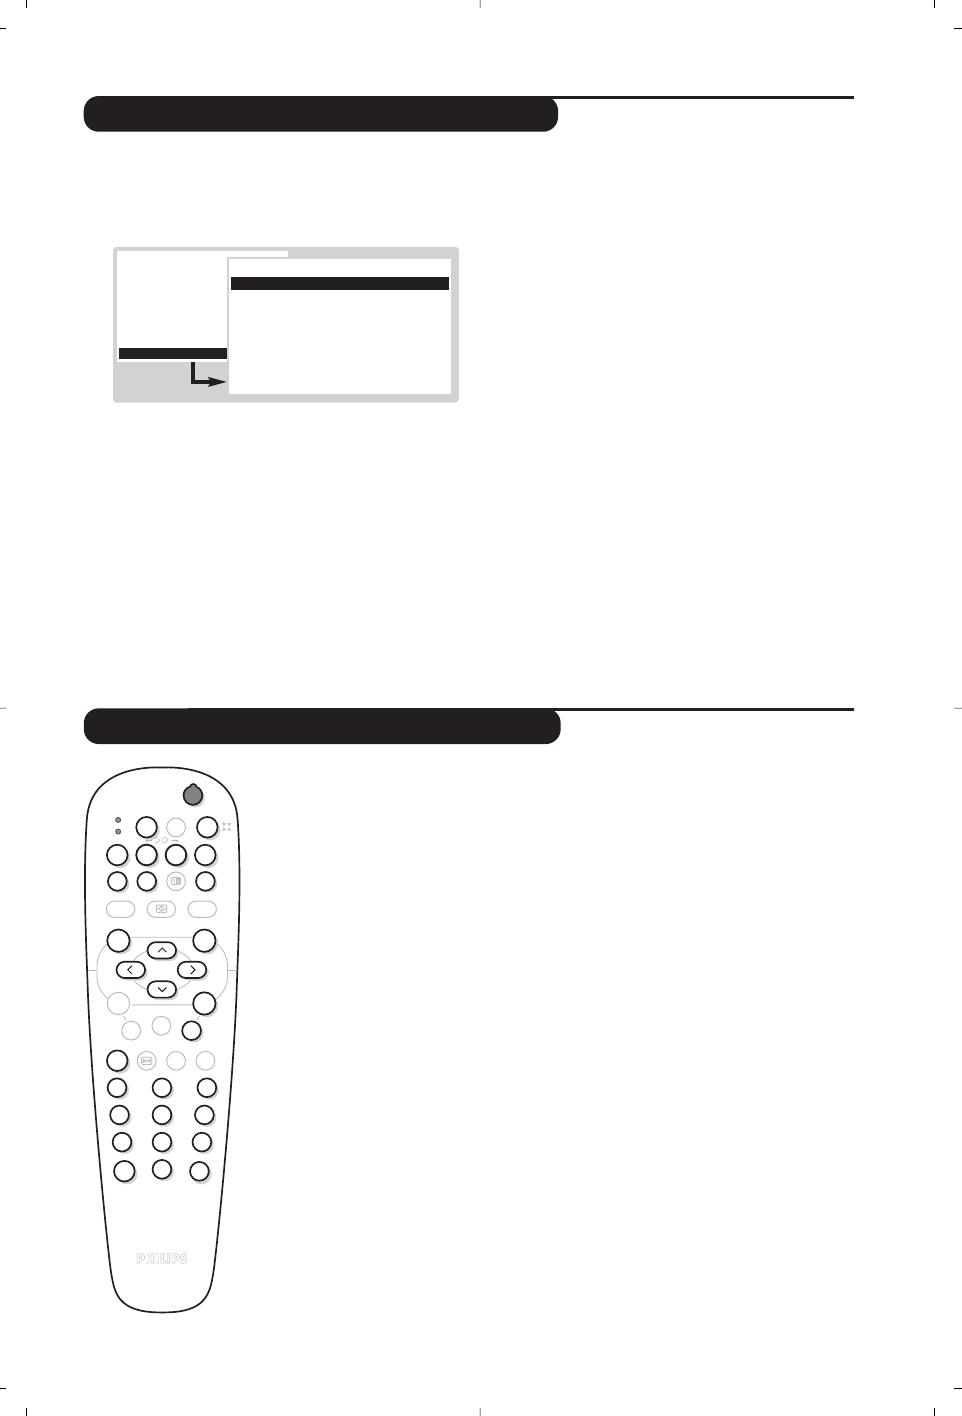 Philips EMG_15761_DK 1/6 28pw8608 12 Dfu Por